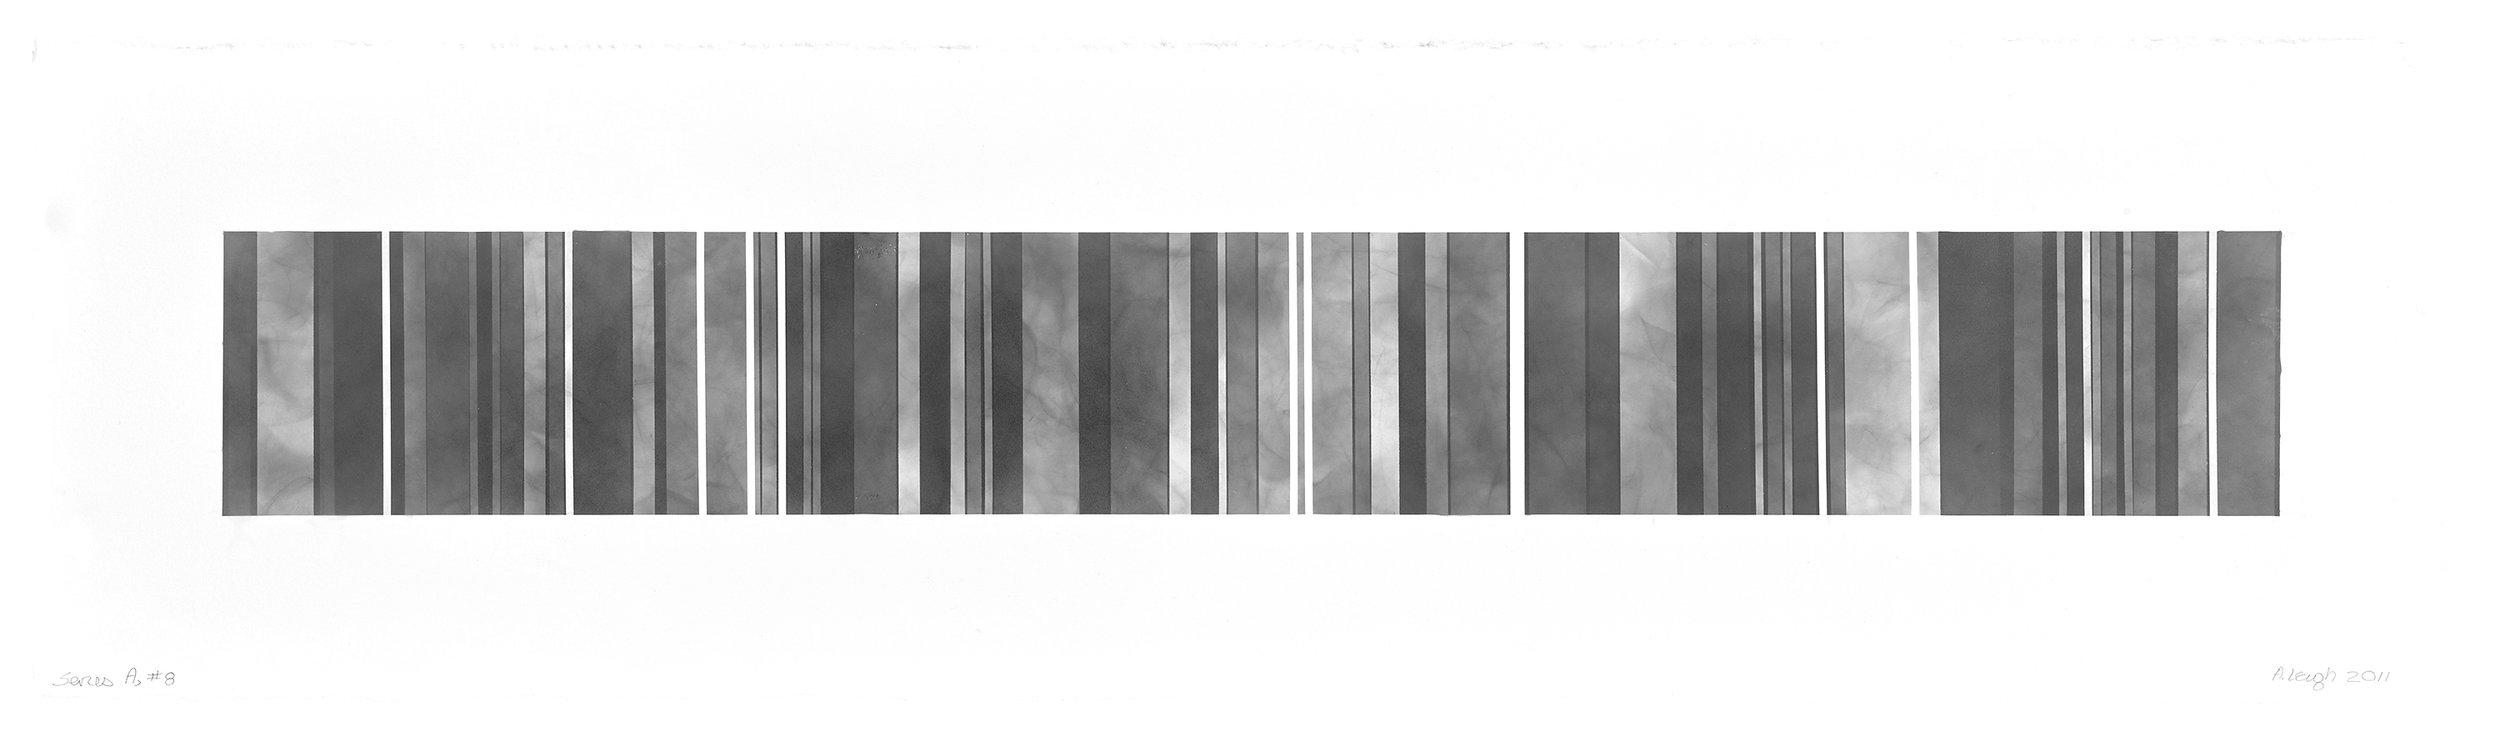 Barcode Series D, 15, 2018 copy.jpg